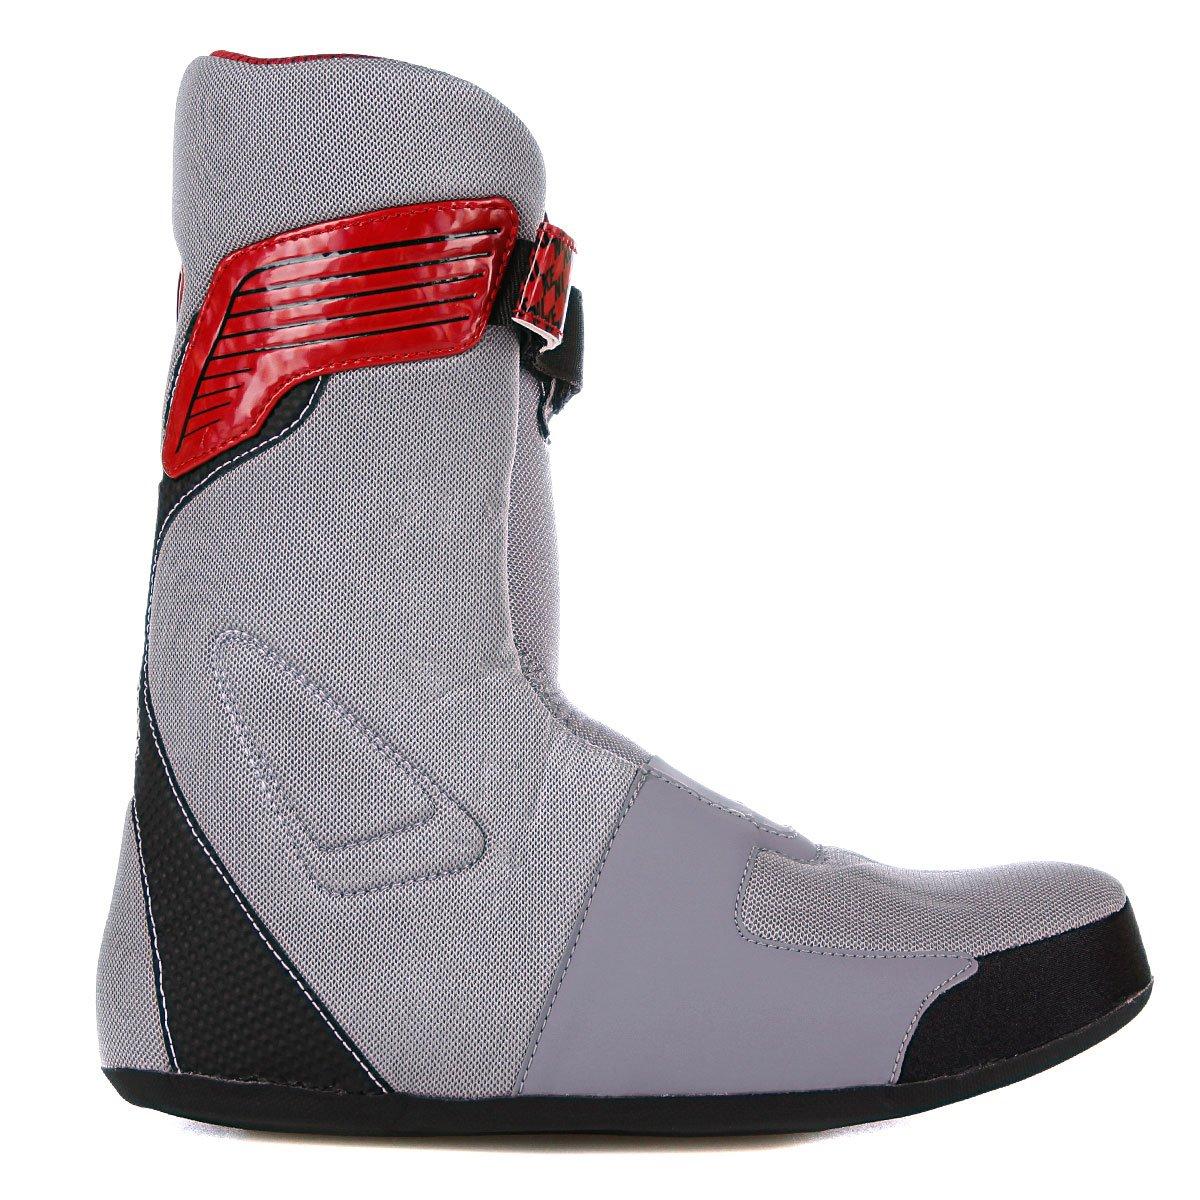 eb48d0b2 Купить ботинки для сноуборда Nike Zoom Kaiju Black/Black (376276-003 ...